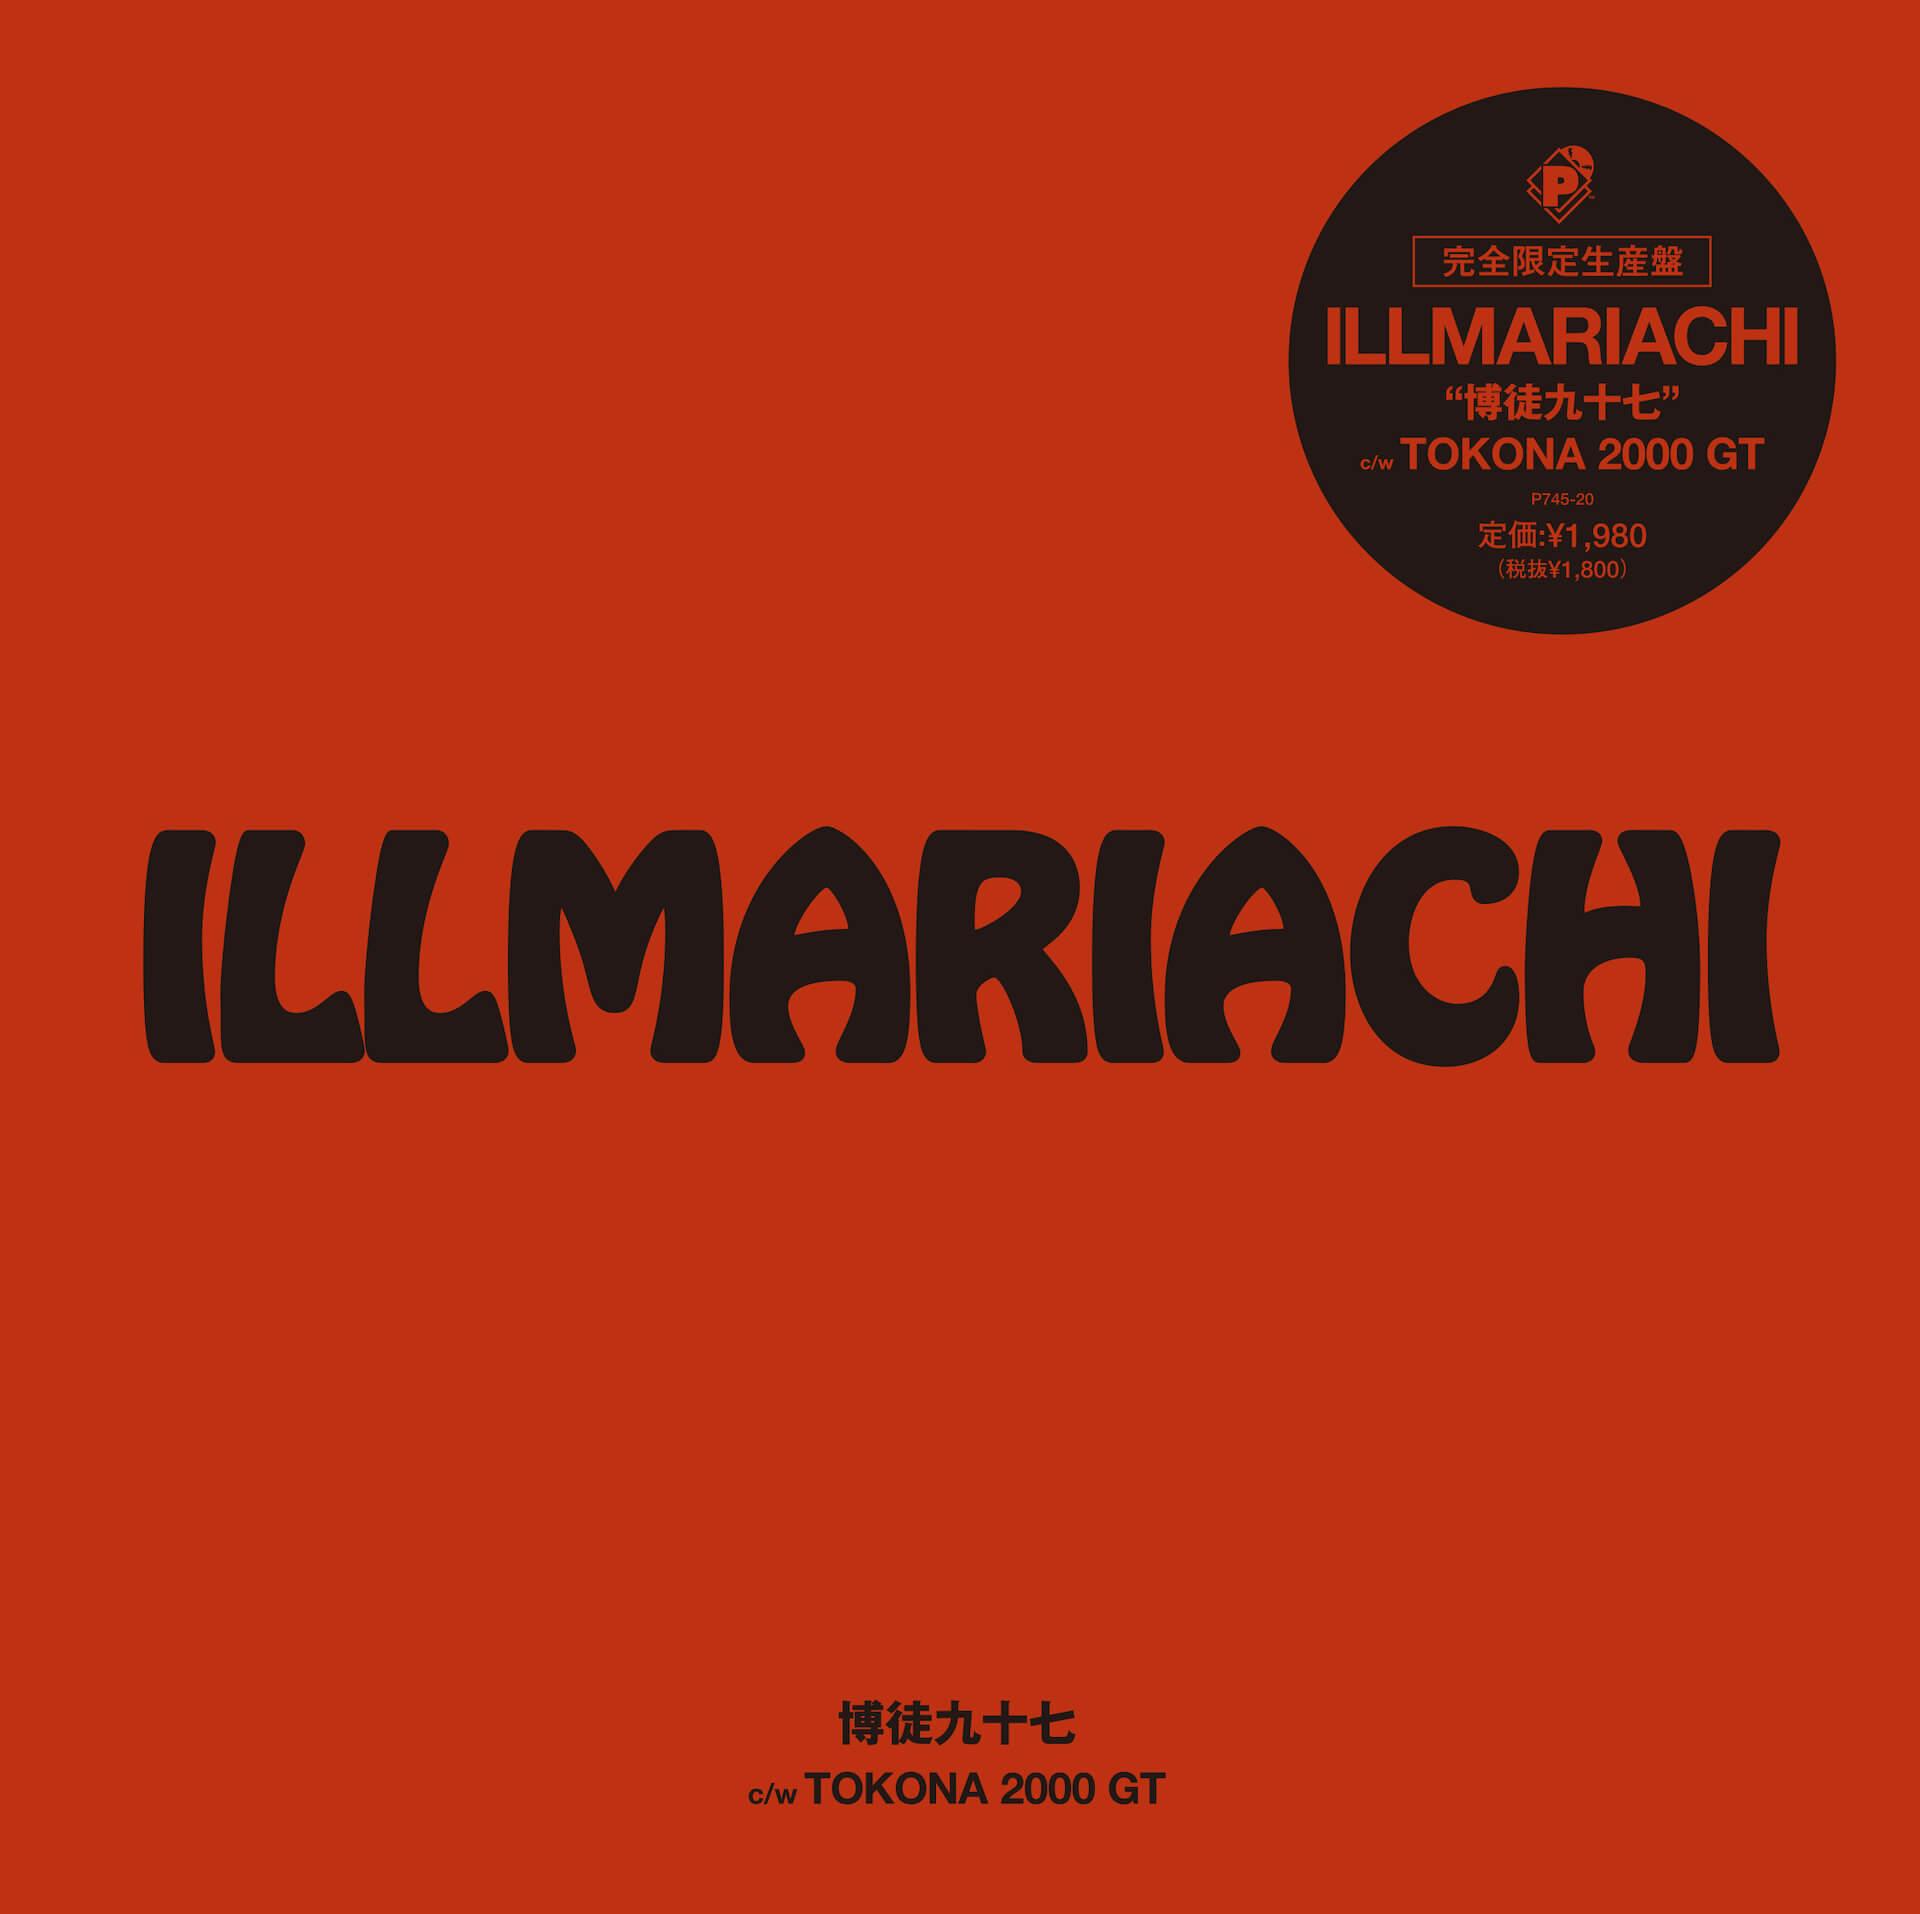 ILLMARIACHIの『THA MASTA BLUSTA』よりクラシック2曲が完全限定プレスの7インチとしてリリース決定! music210514_illmariachi-210514_2